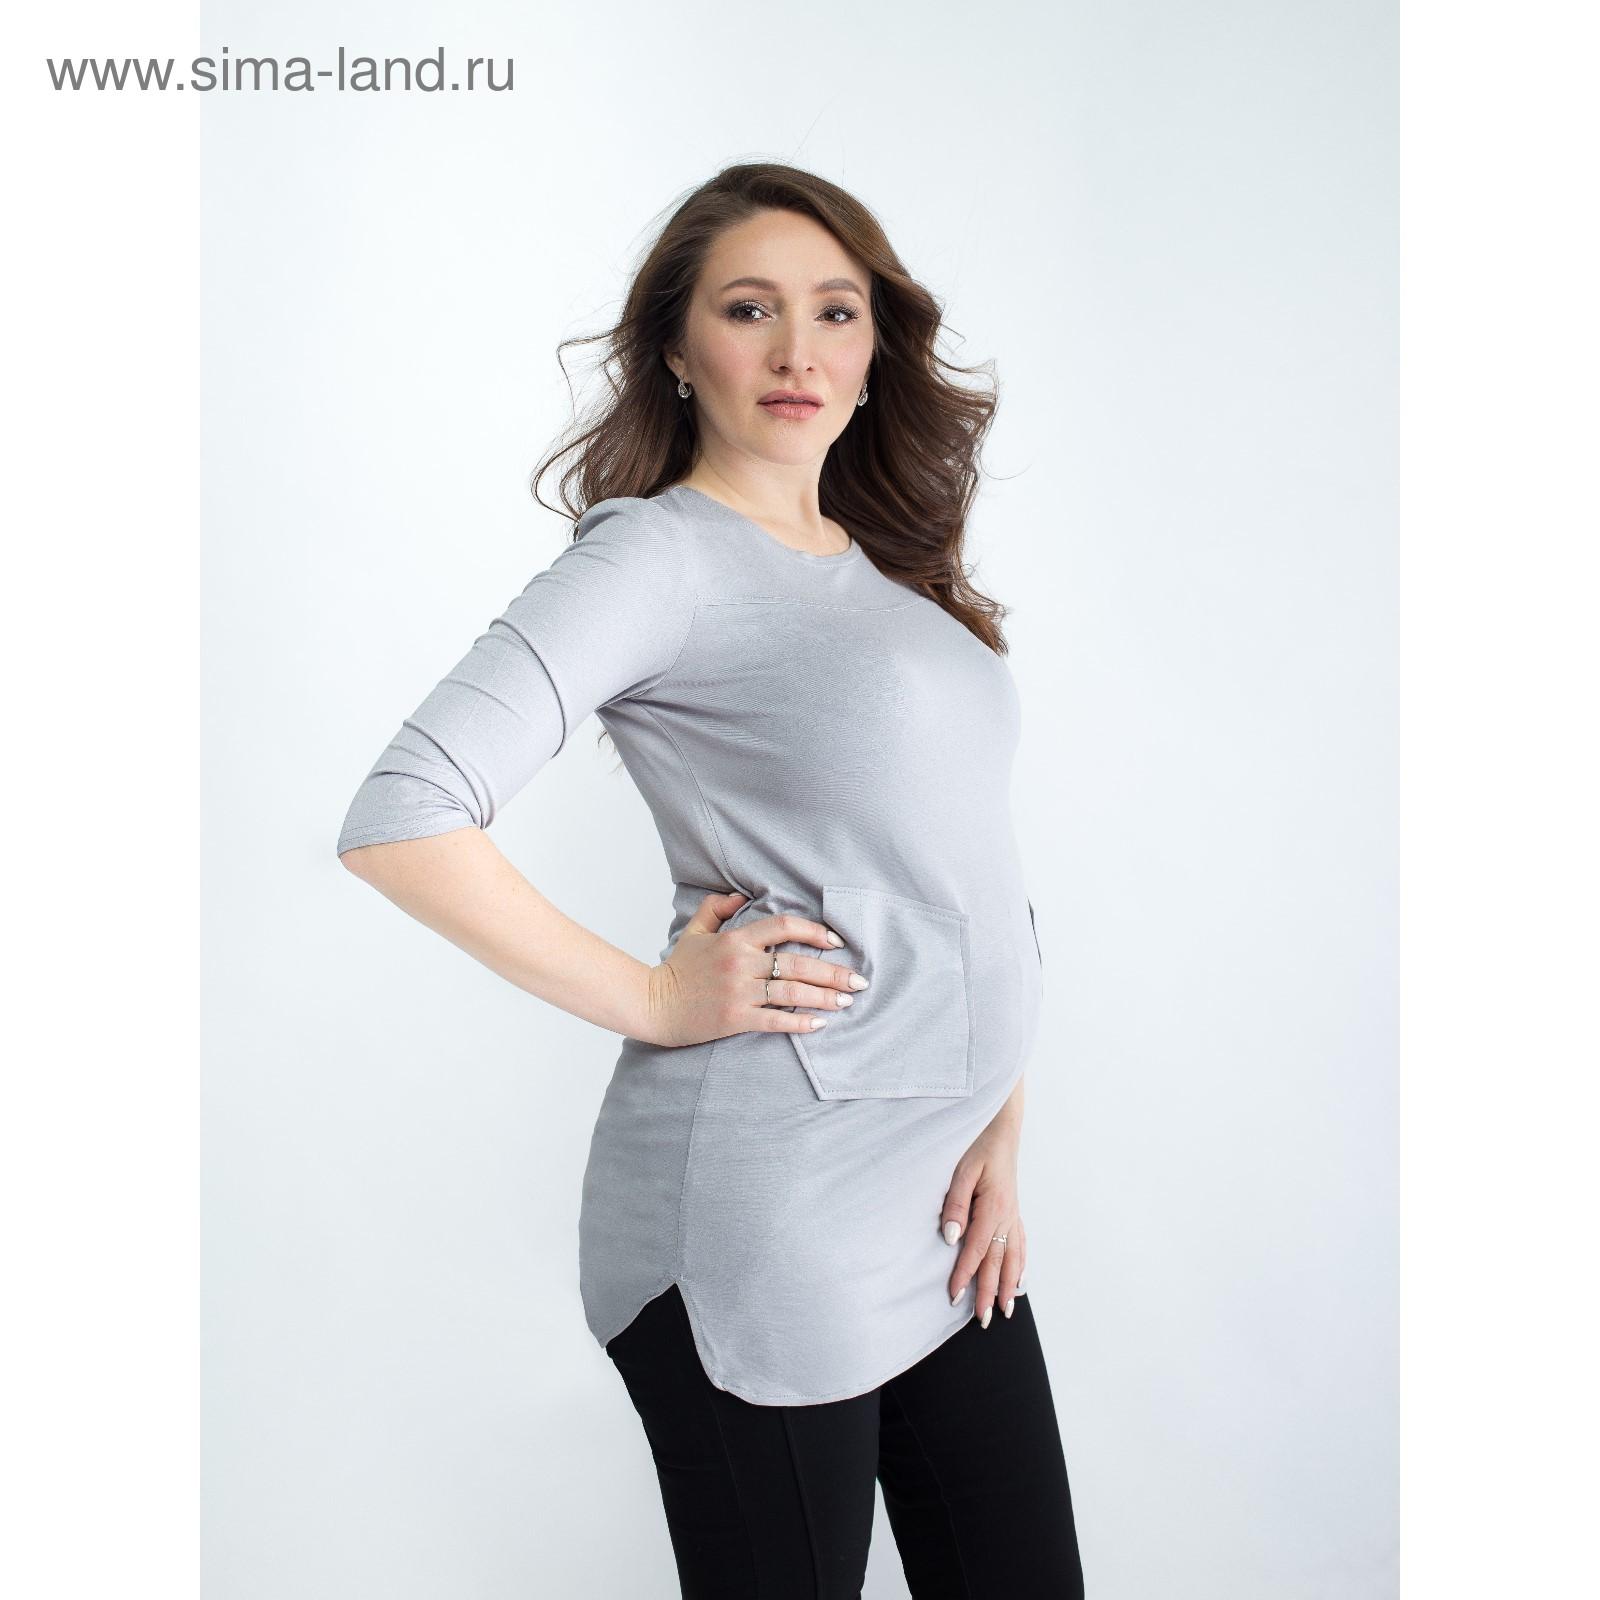 eaa6b8f7e8313 Блузка для беременных 2273, цвет свет. серый, размер 50, рост 170 ...